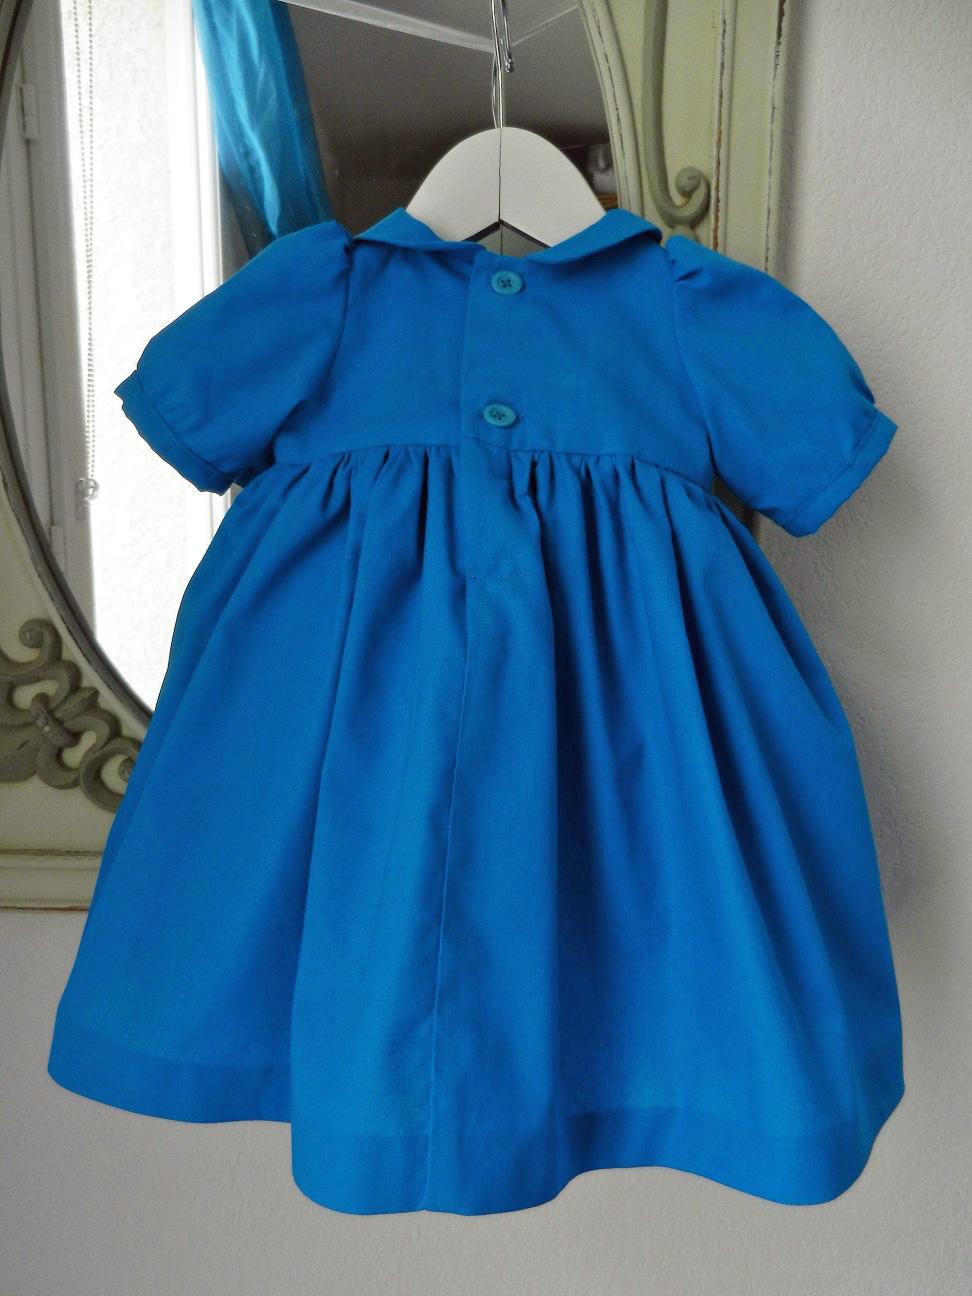 Duchesse or ange 190 robe bleue alice tablier blanc jupon blue dress white apron petticoat c